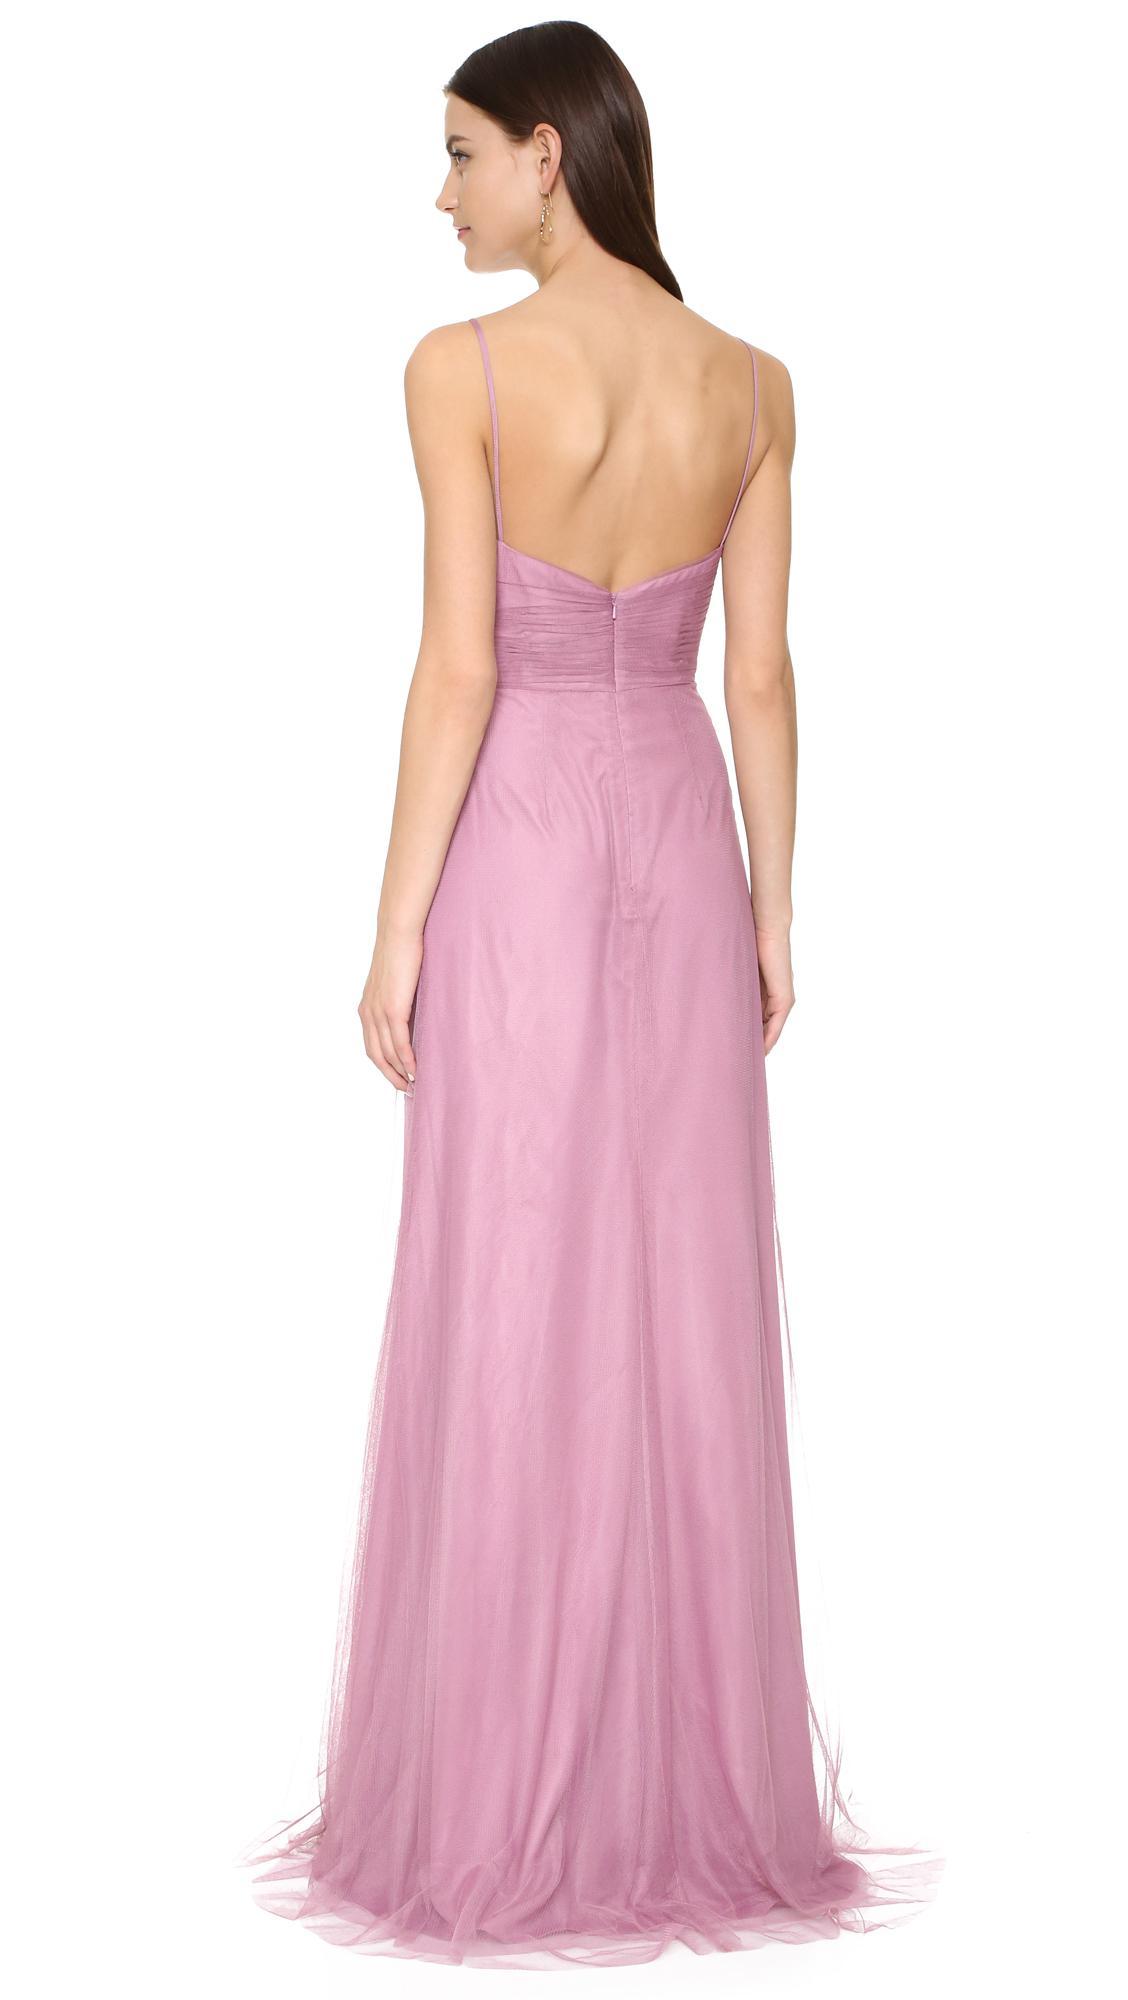 df78c7195be Lyst - Monique Lhuillier Bridesmaids Draped Tulle Gown in Purple